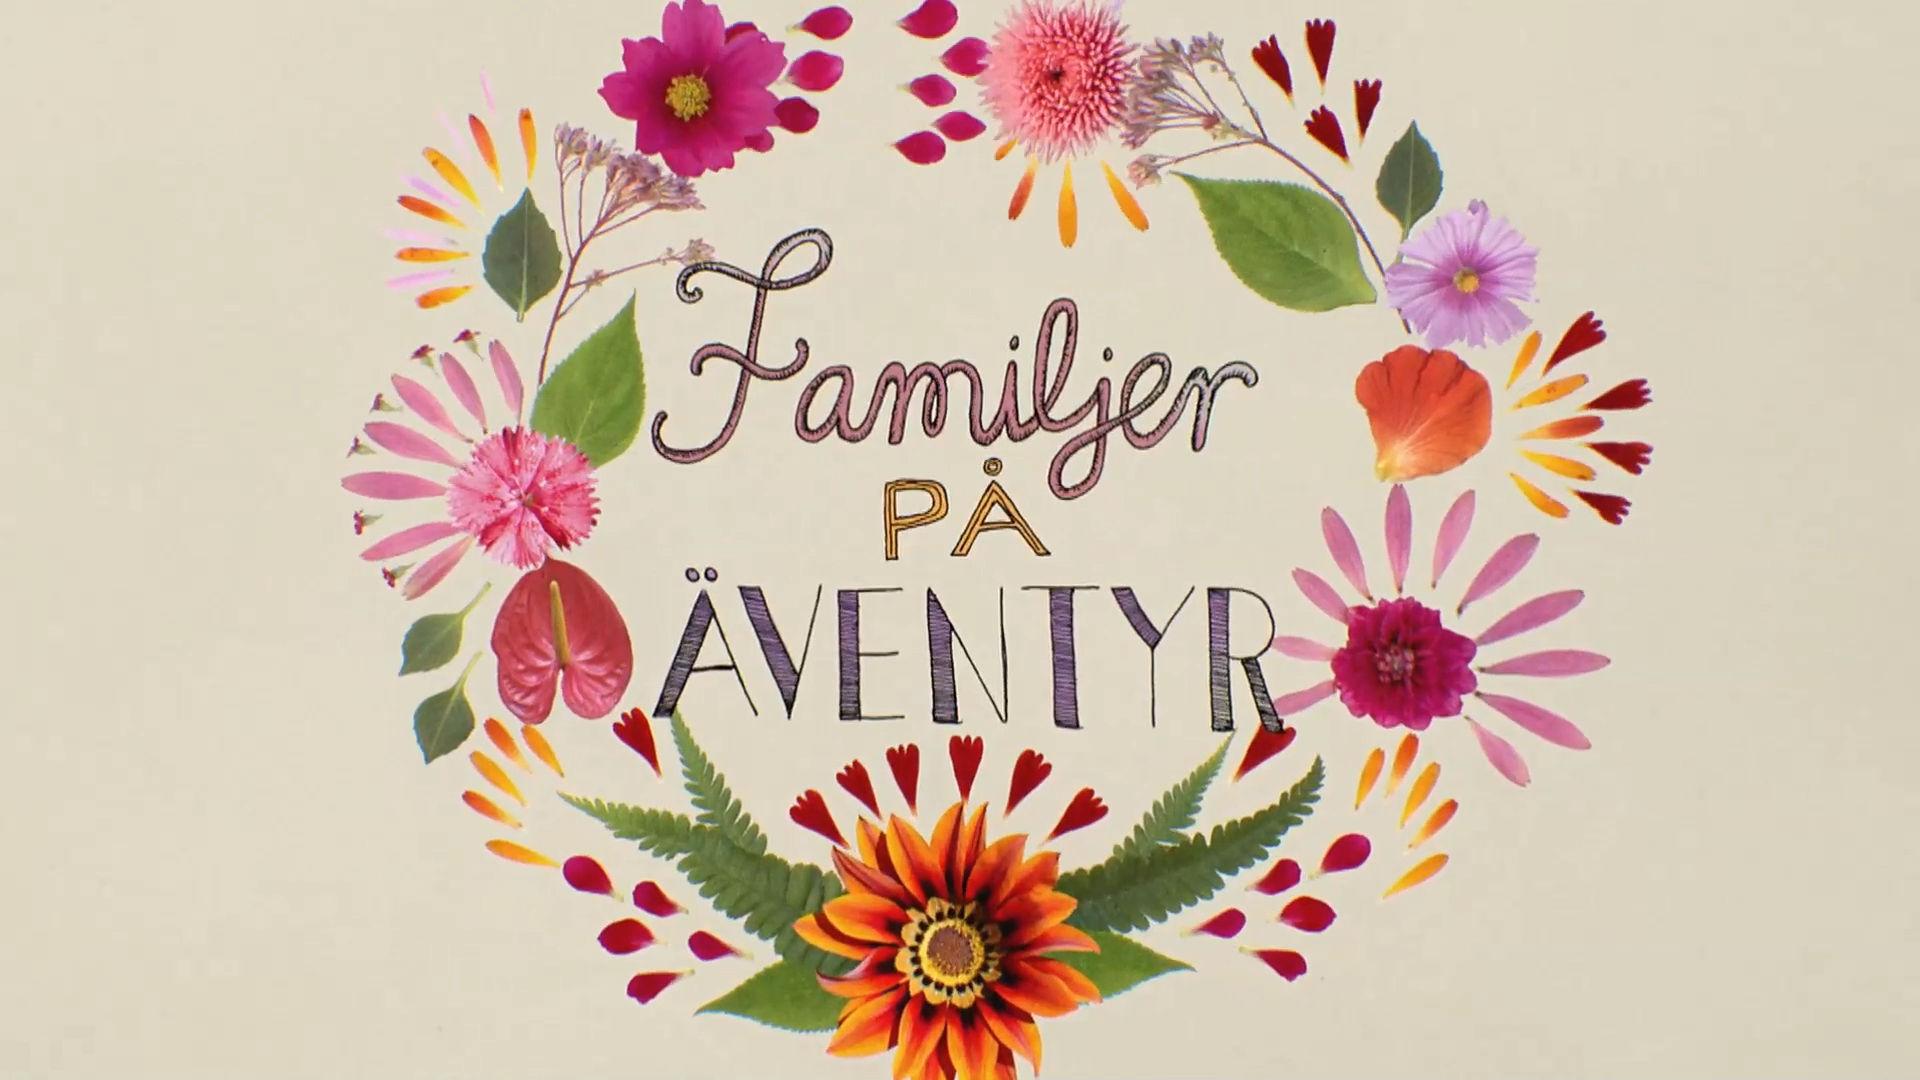 Familjer-pa-aventyr